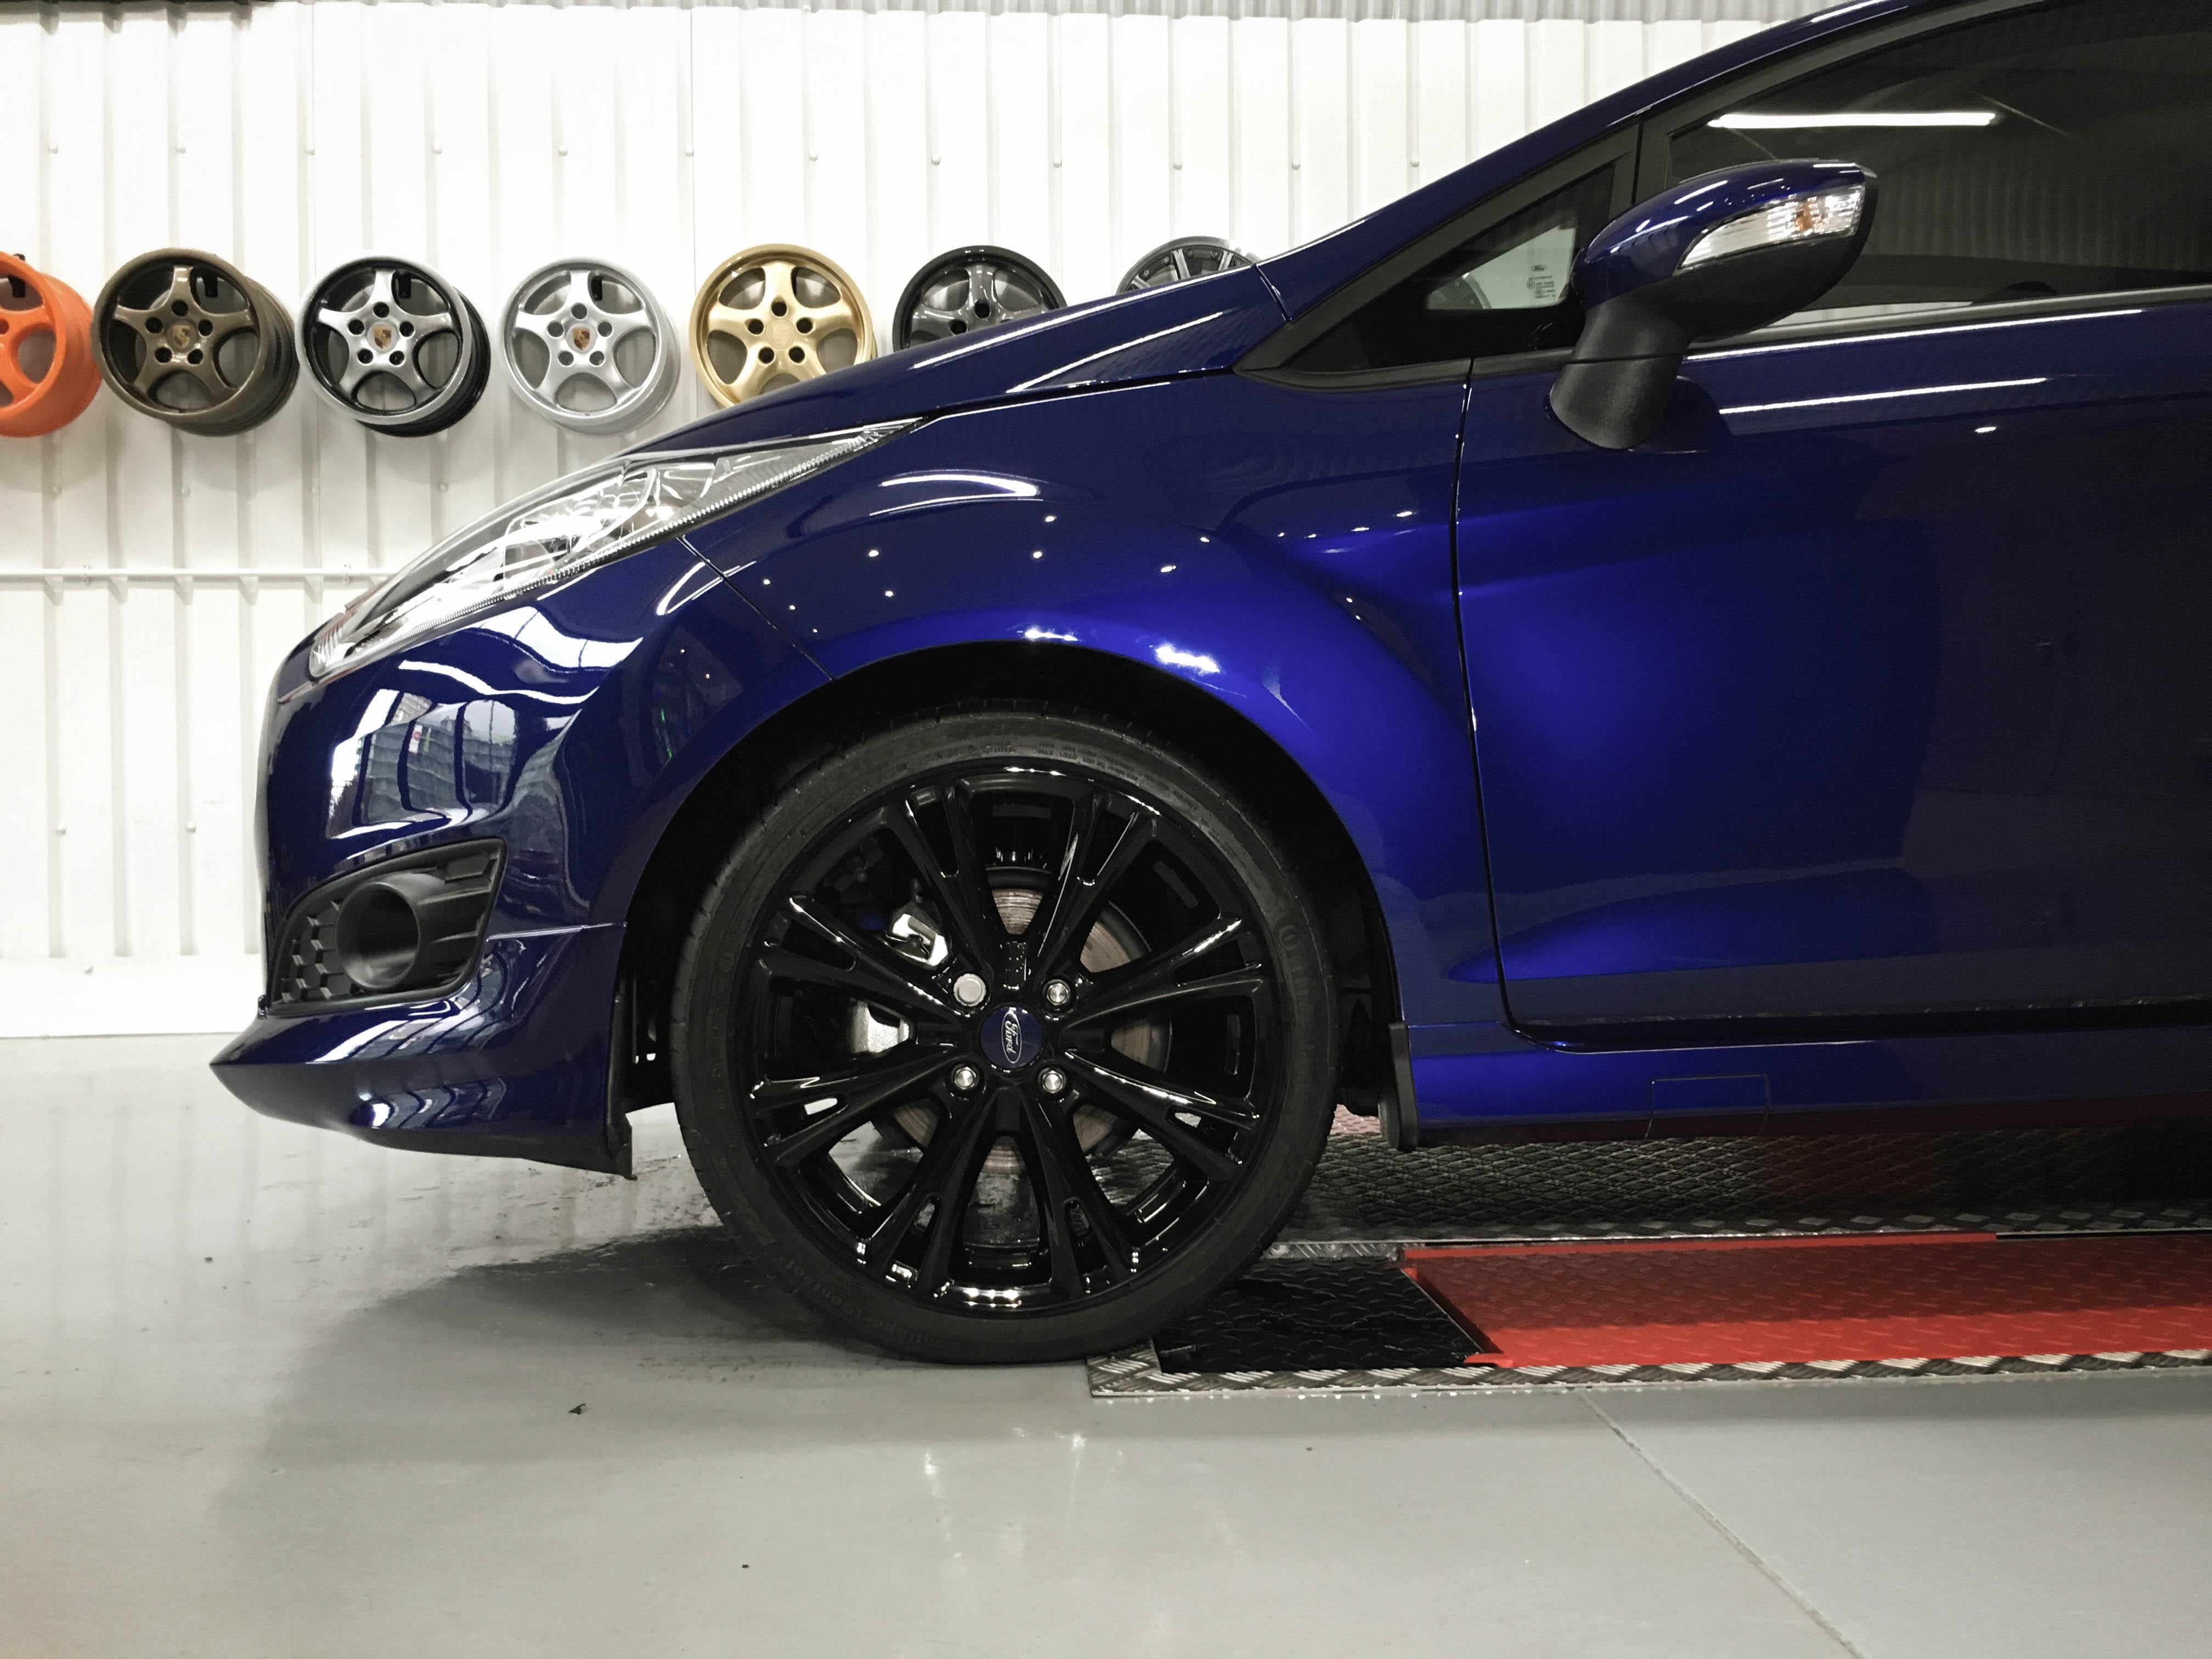 Ford Focus – Wheel